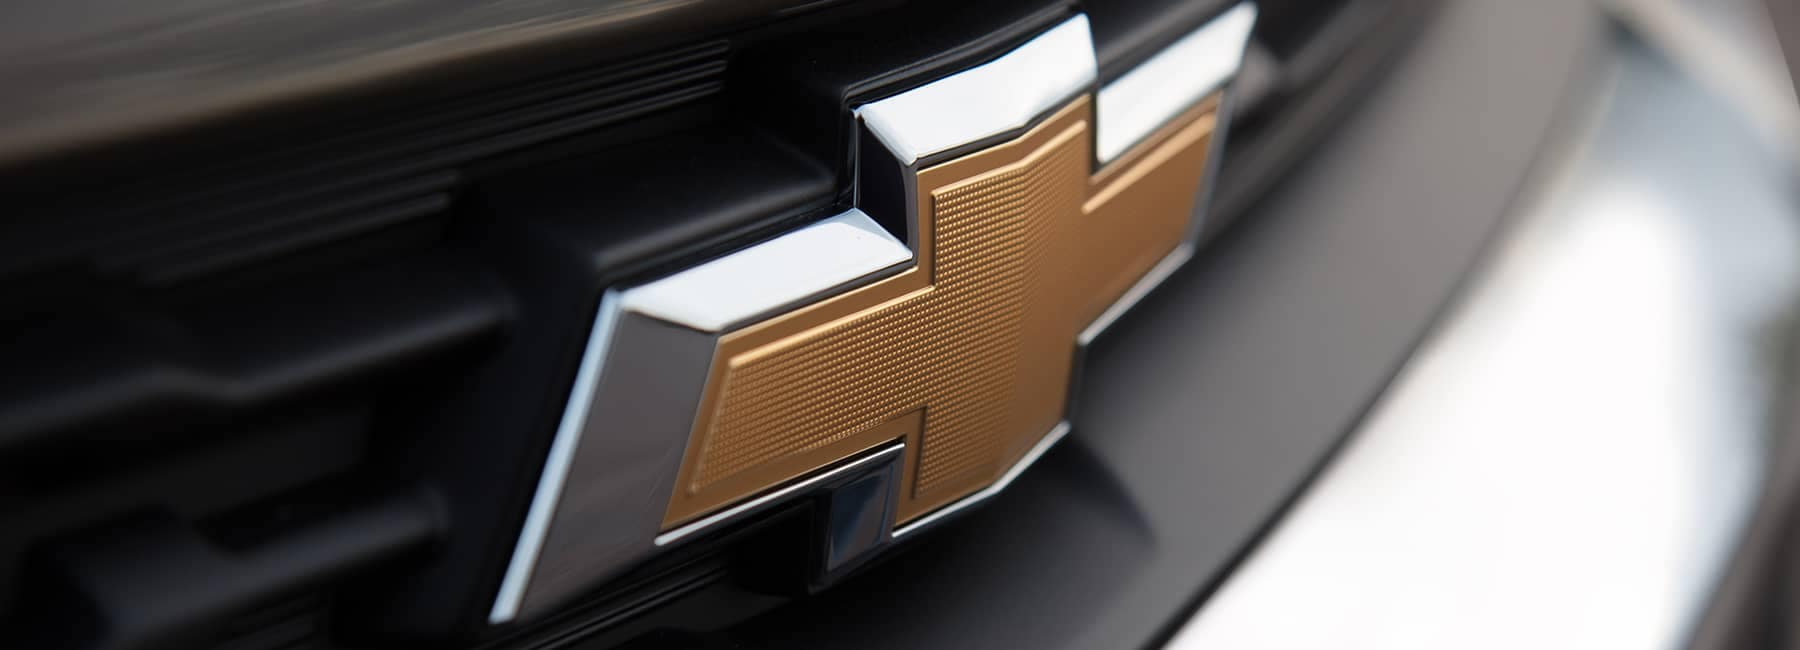 https://di-uploads-development.dealerinspire.com/northbranchchevy/uploads/2020/06/2021-Chevrolet-Trailblazer-Front-Grille_mobile.jpg